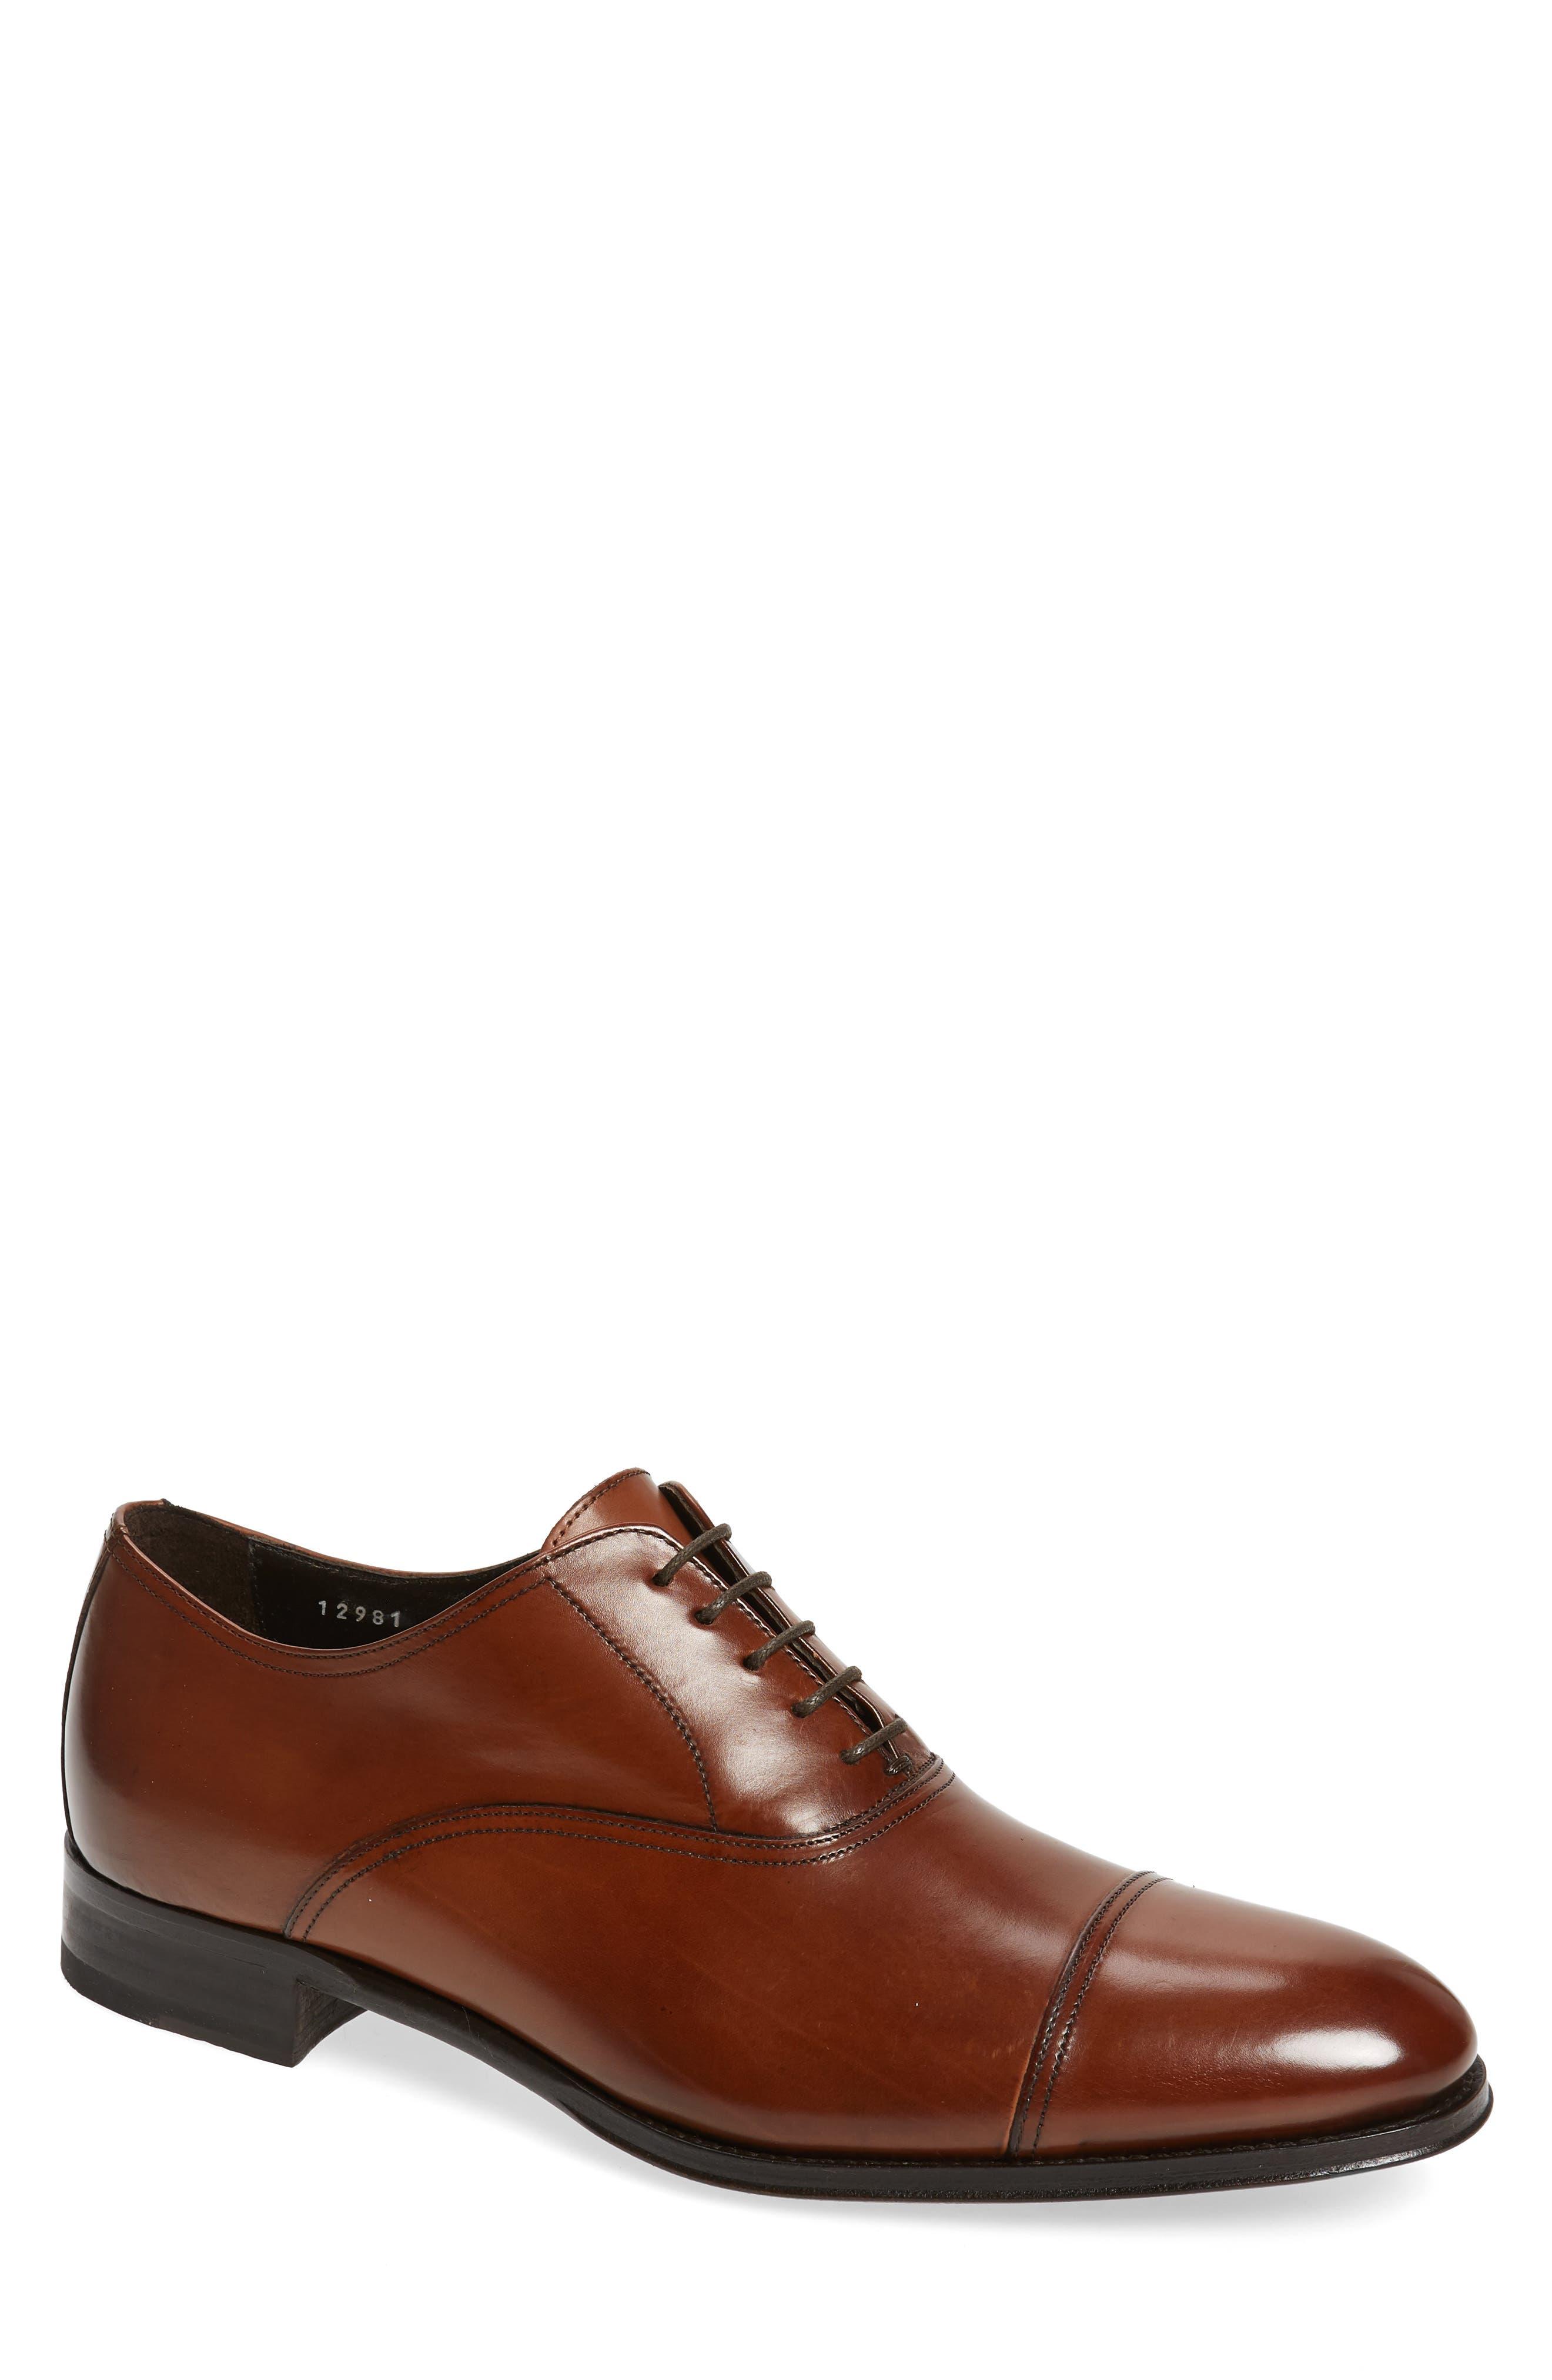 Men's Shoes Sale \u0026 Clearance   Nordstrom